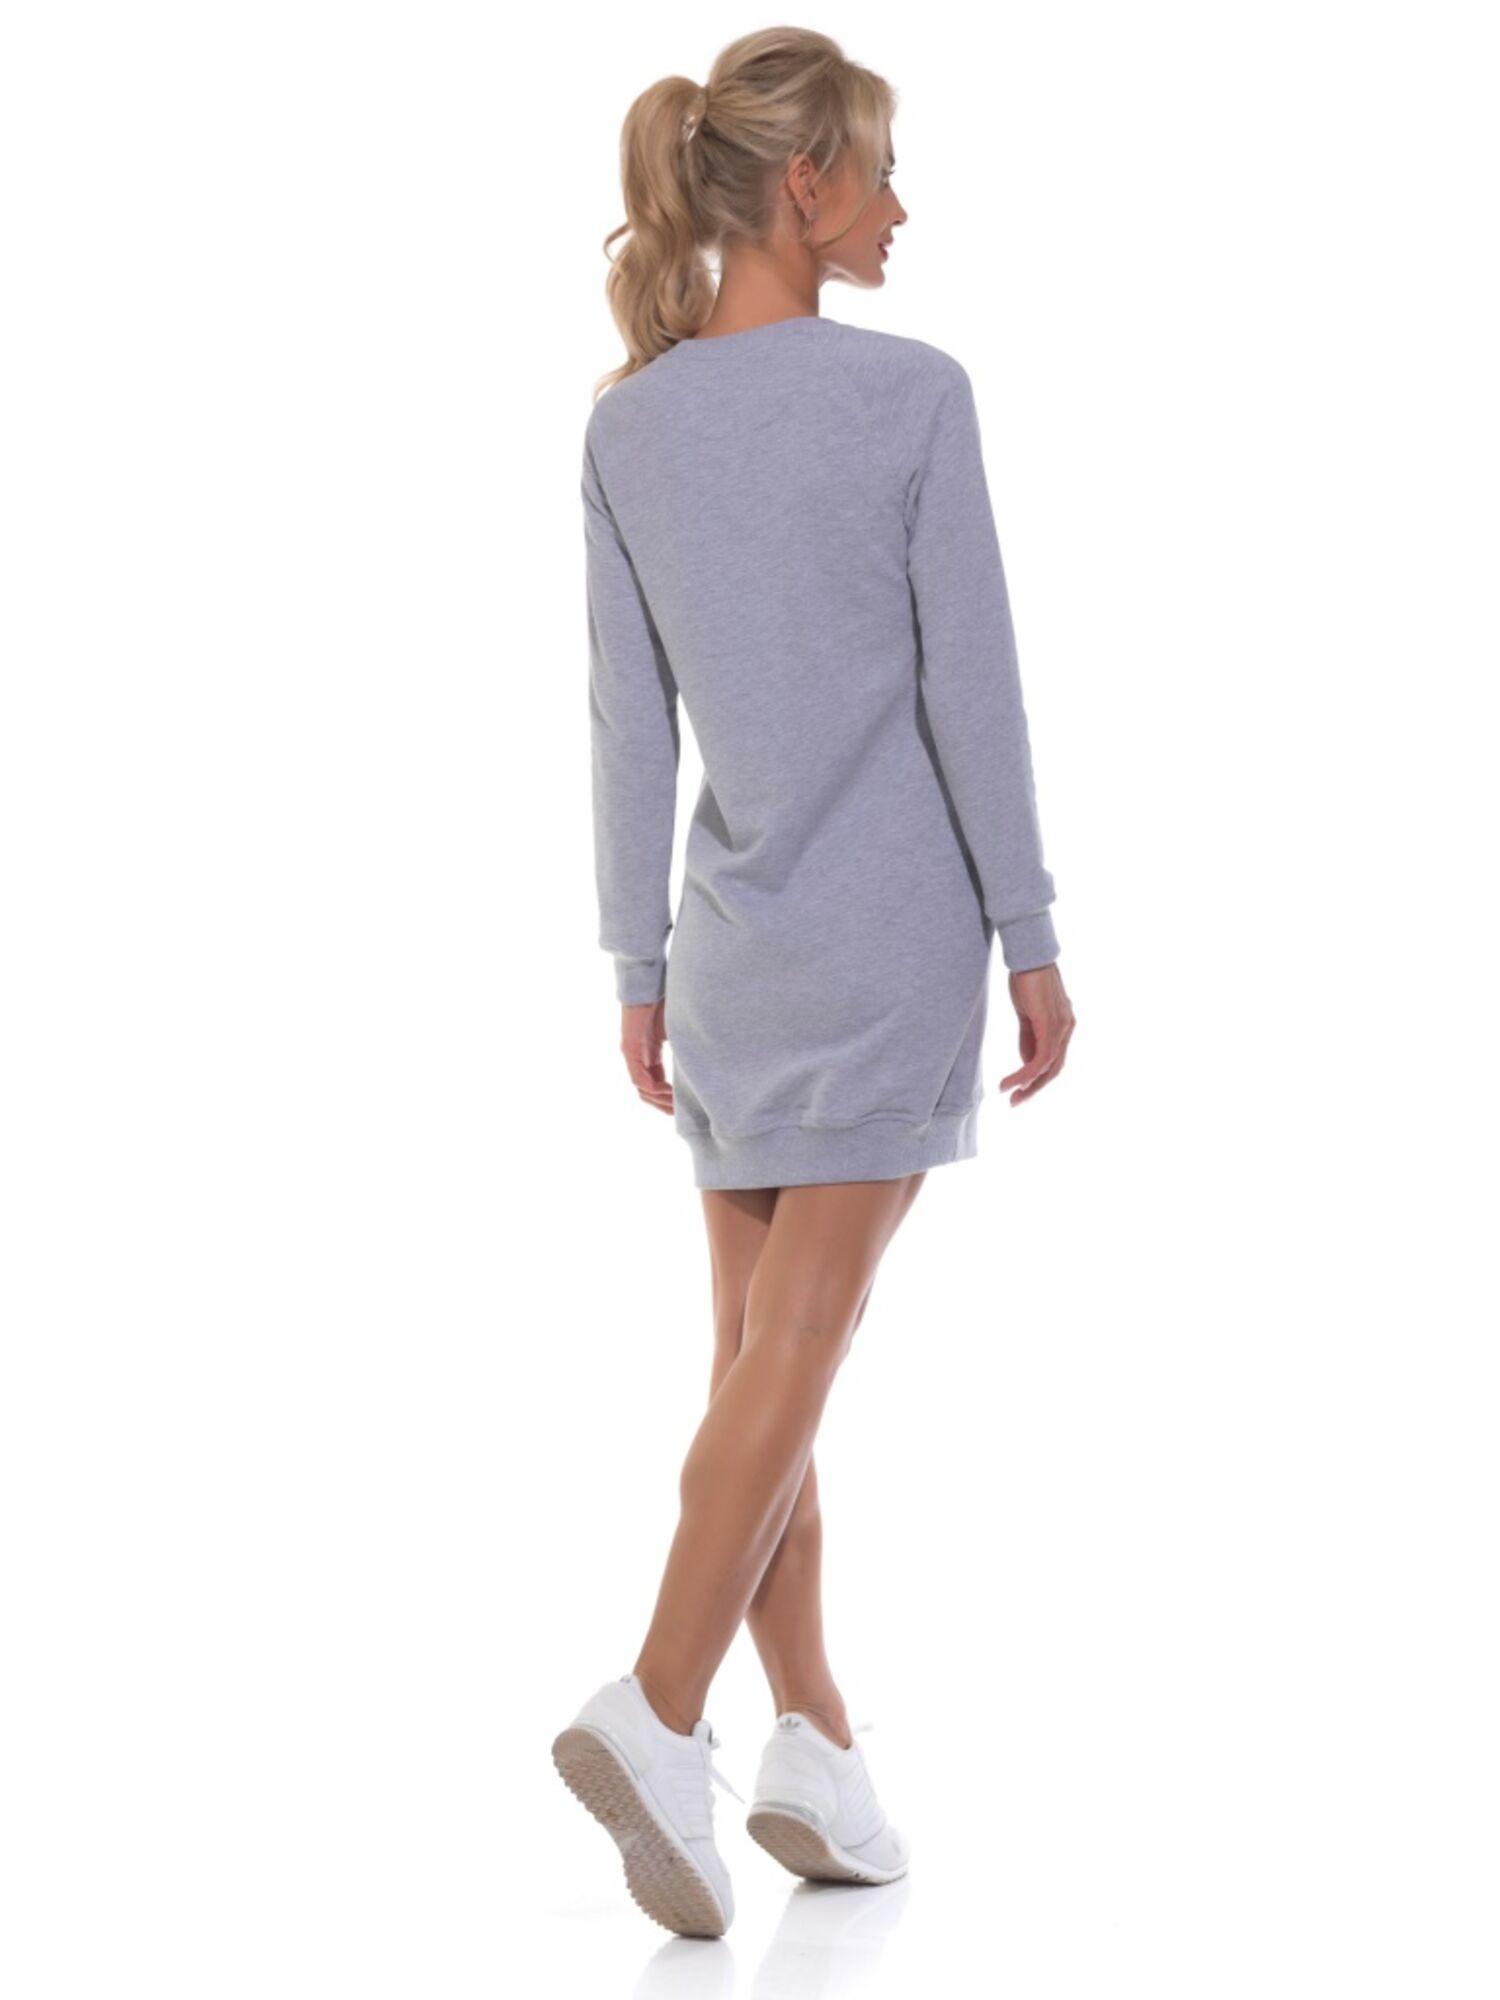 Женский удлиненный свитшот-туника Always Mini1707 серый меланж, Peche Monnaie (Россия)